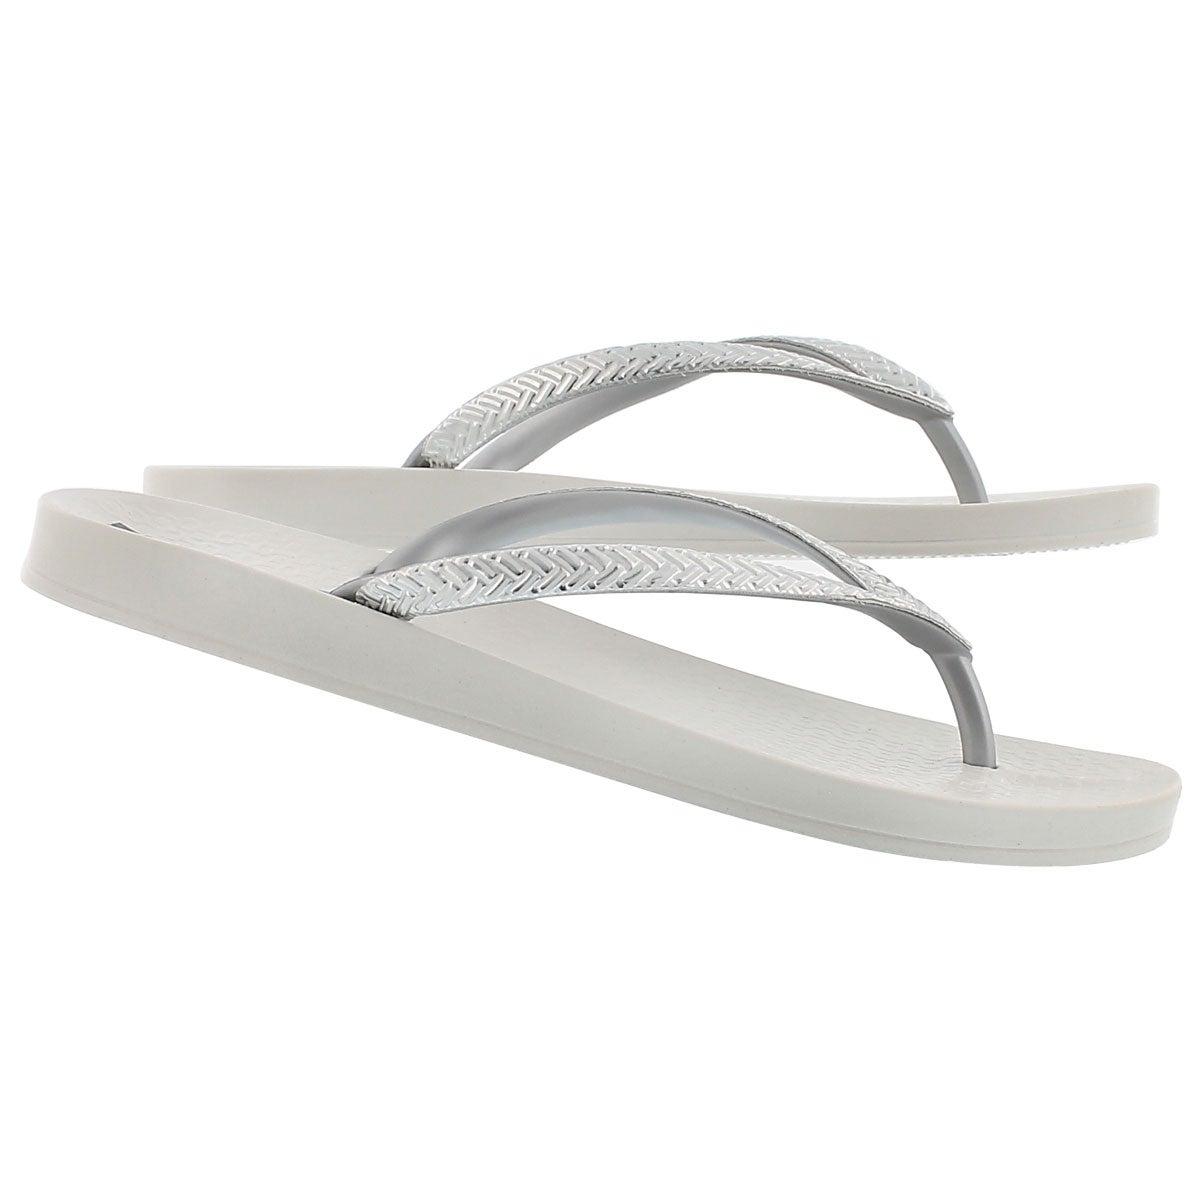 Sandale tong MESH FEM, blanc/arg, femmes